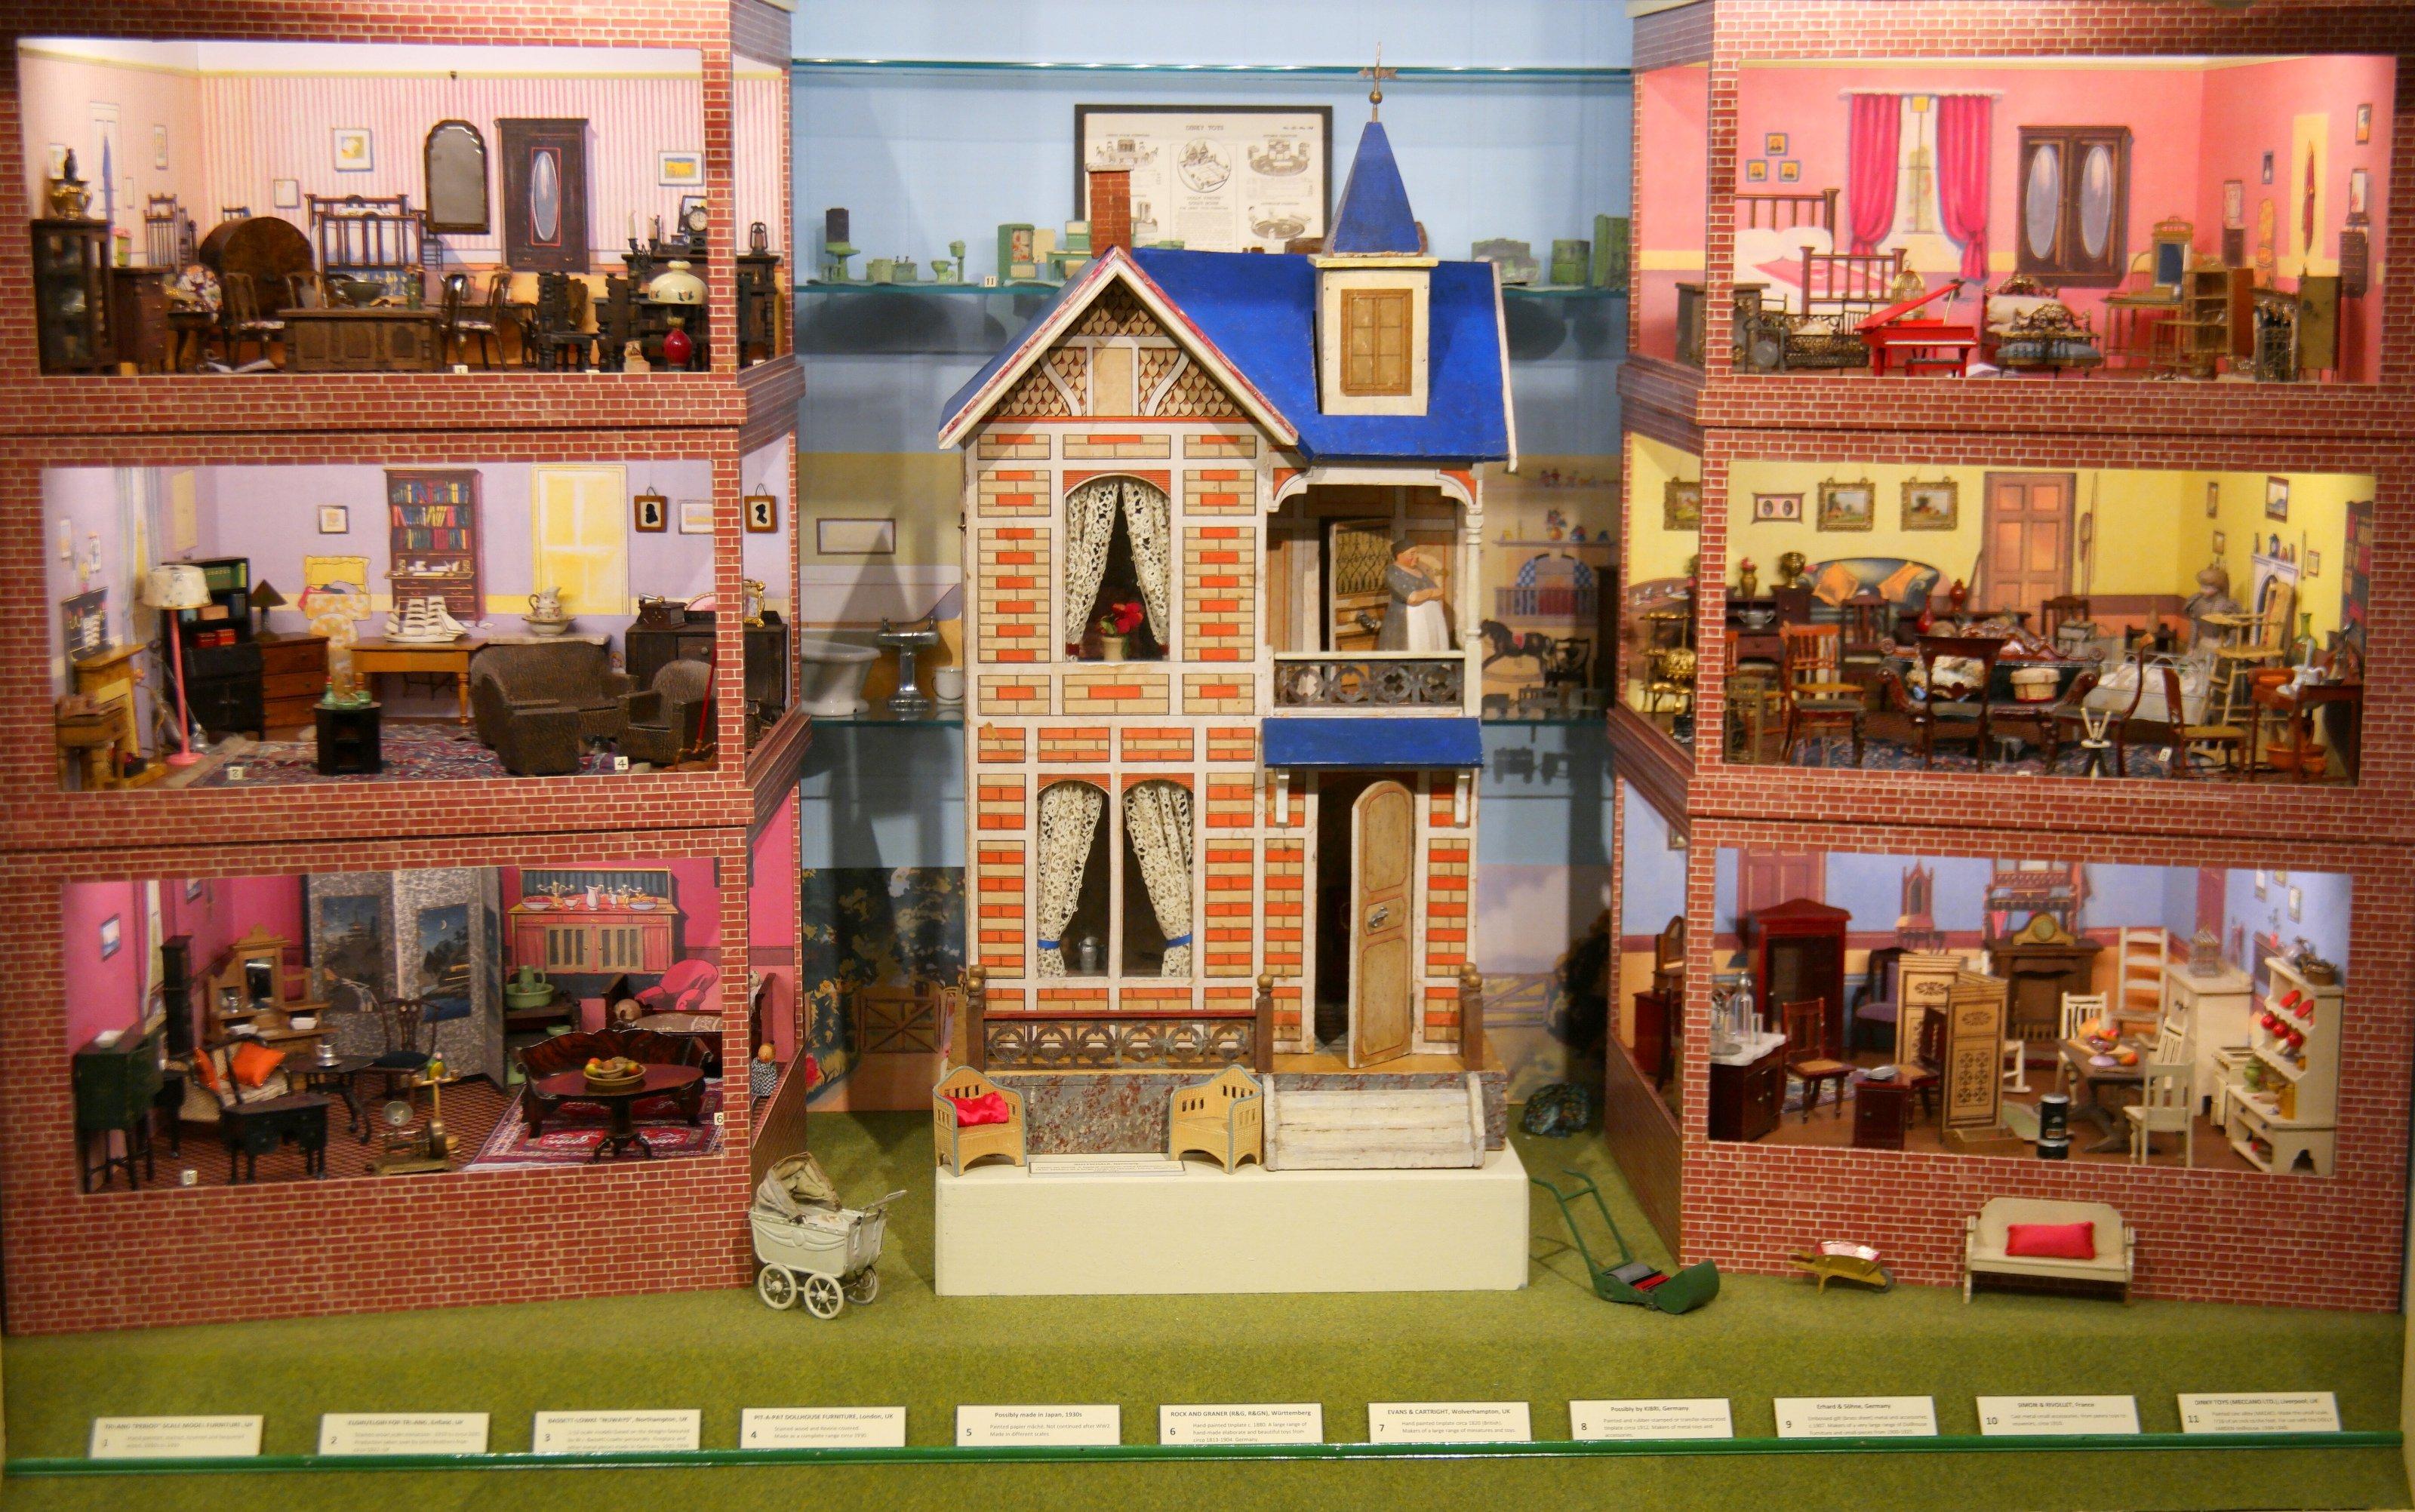 File:Gottschalk dollhouse and dollhouse miniatures, 2016 (Brighton